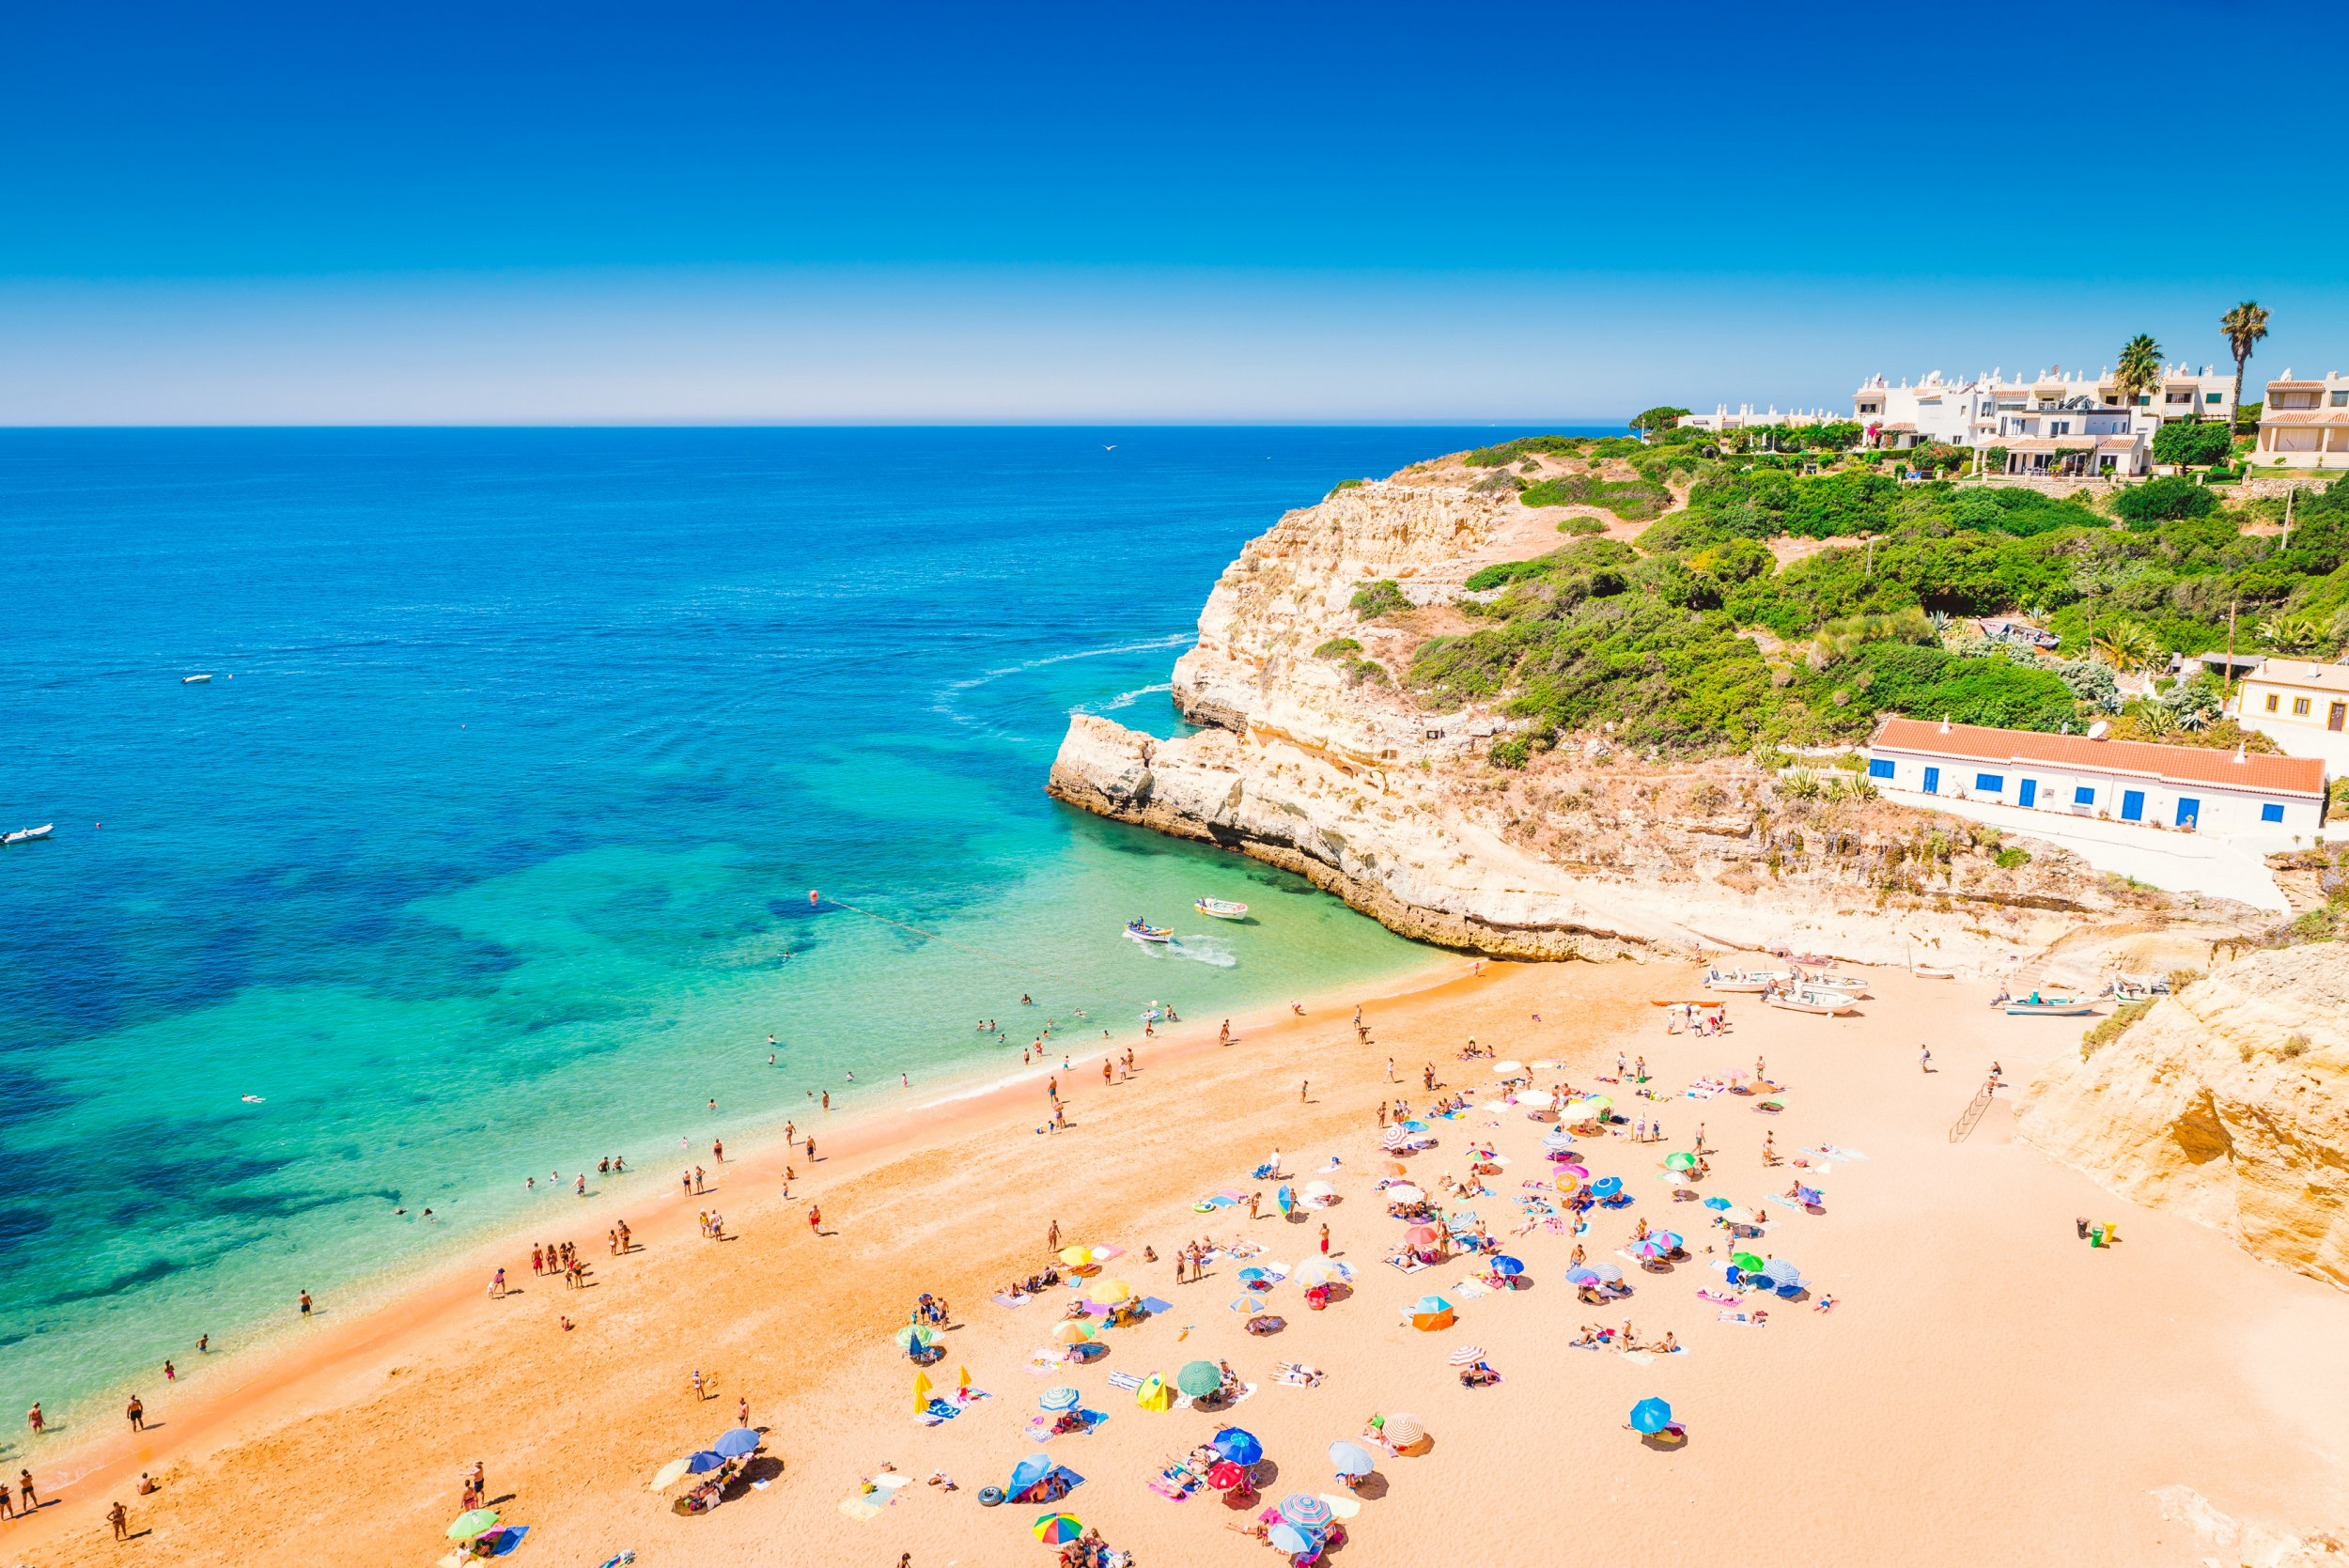 British woman 'raped on holiday in Portugal by Irishman'